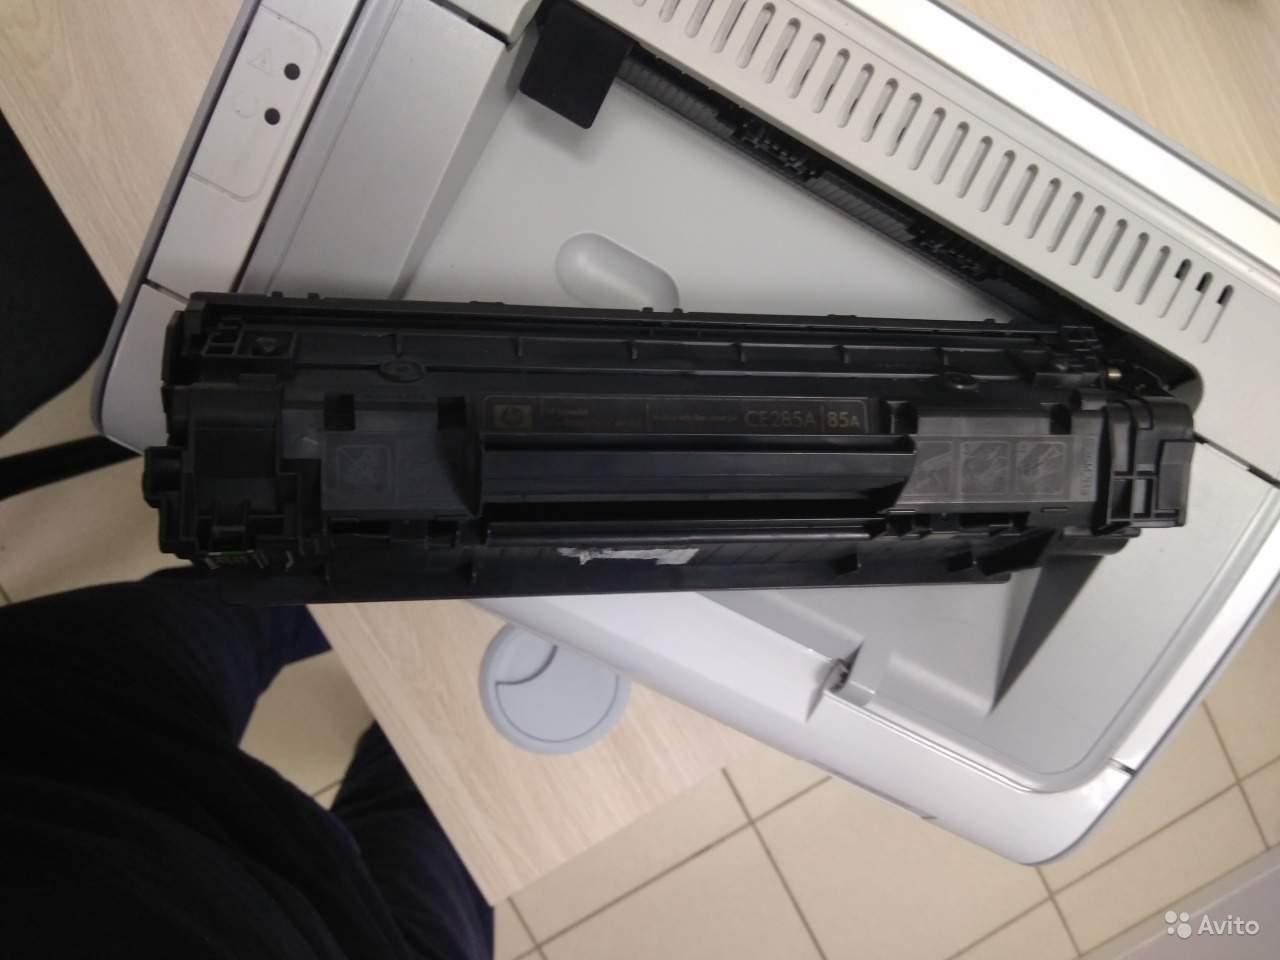 Продам hp laserjet p1102, p1005, p2015, МФУ HP M1120 ...: https://izhevsk.ru/forummessage/24/5633777-0.html